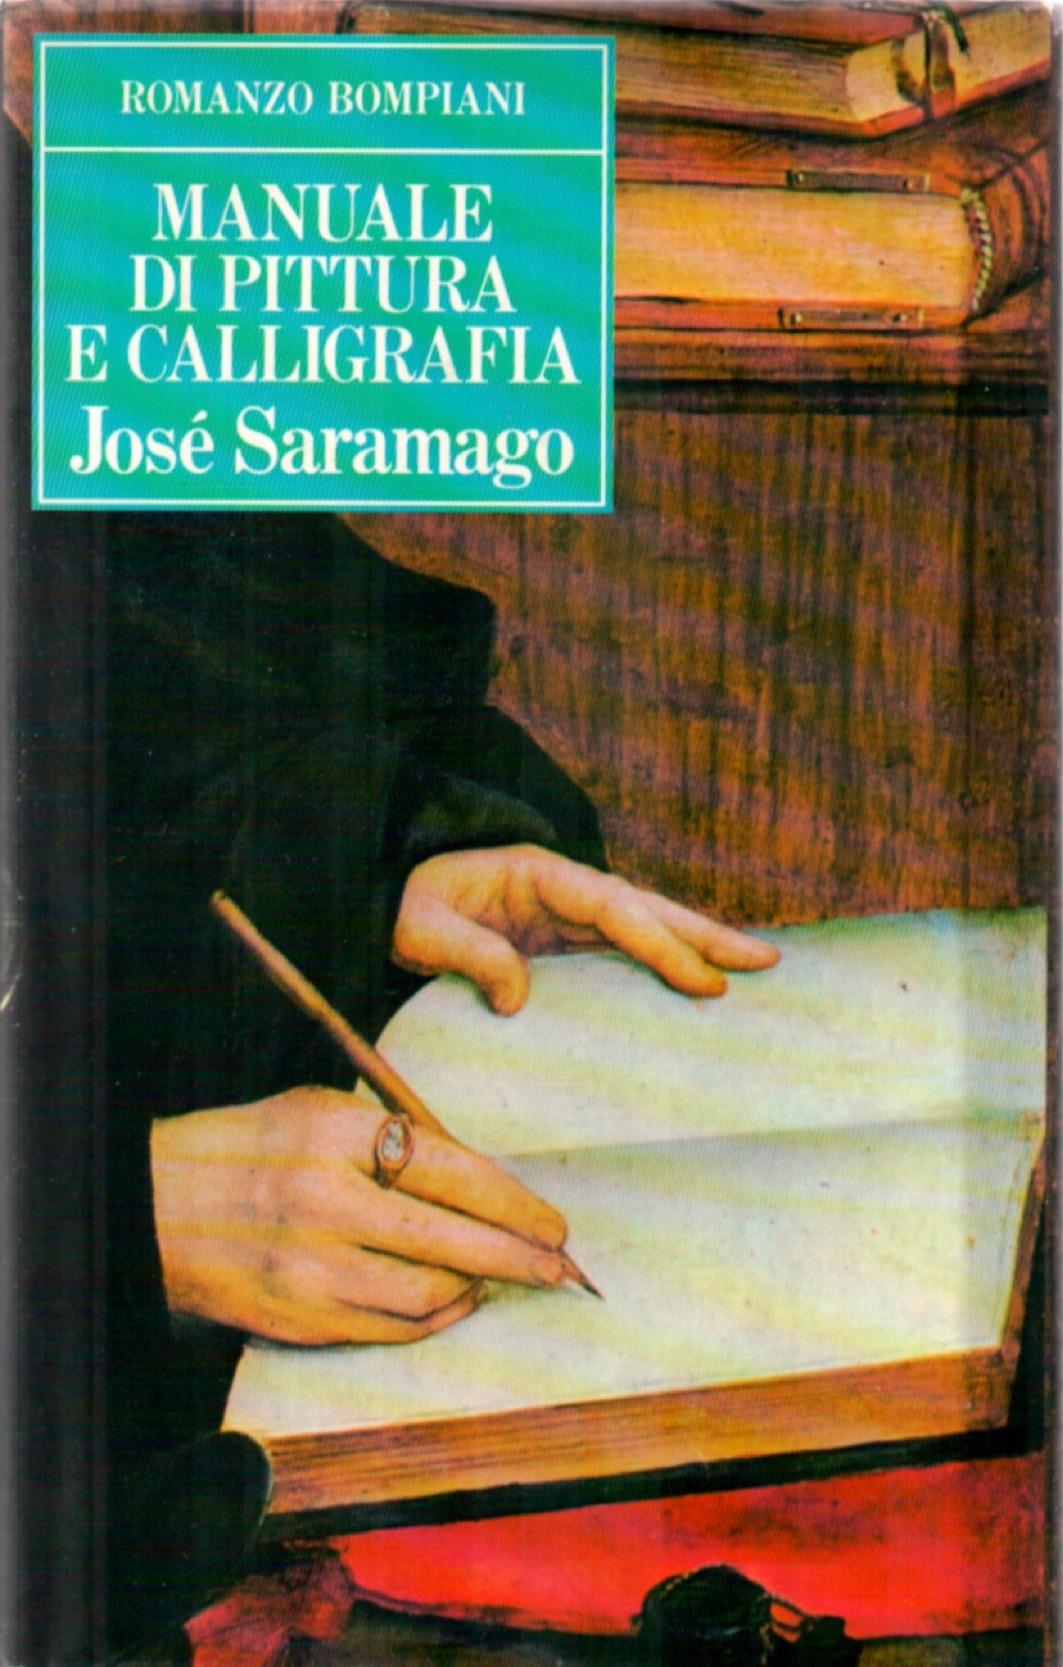 Manuale di pittura e calligrafia